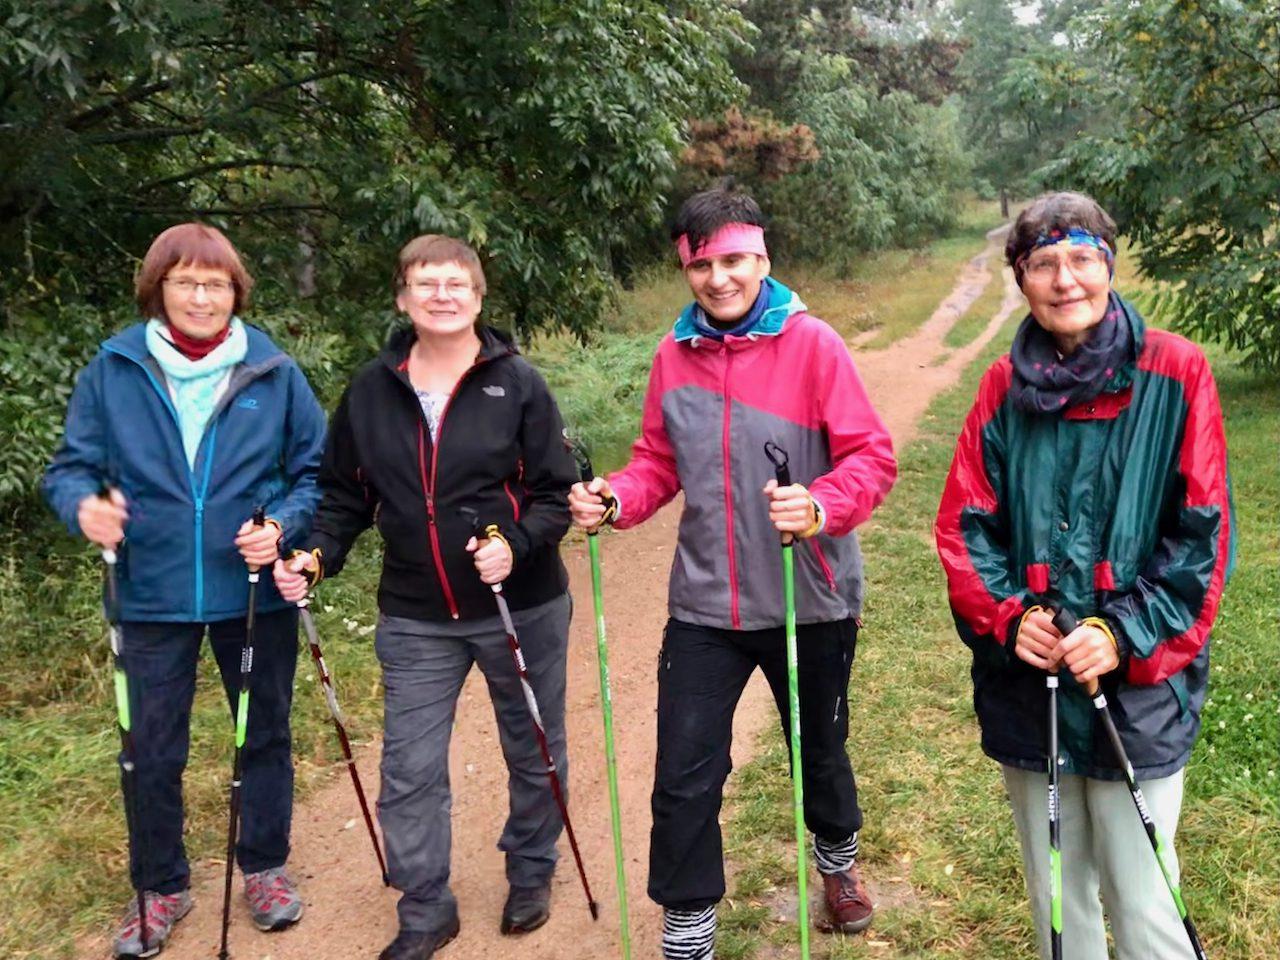 Nordic walking v severském duchu SISU, 6.10.2021